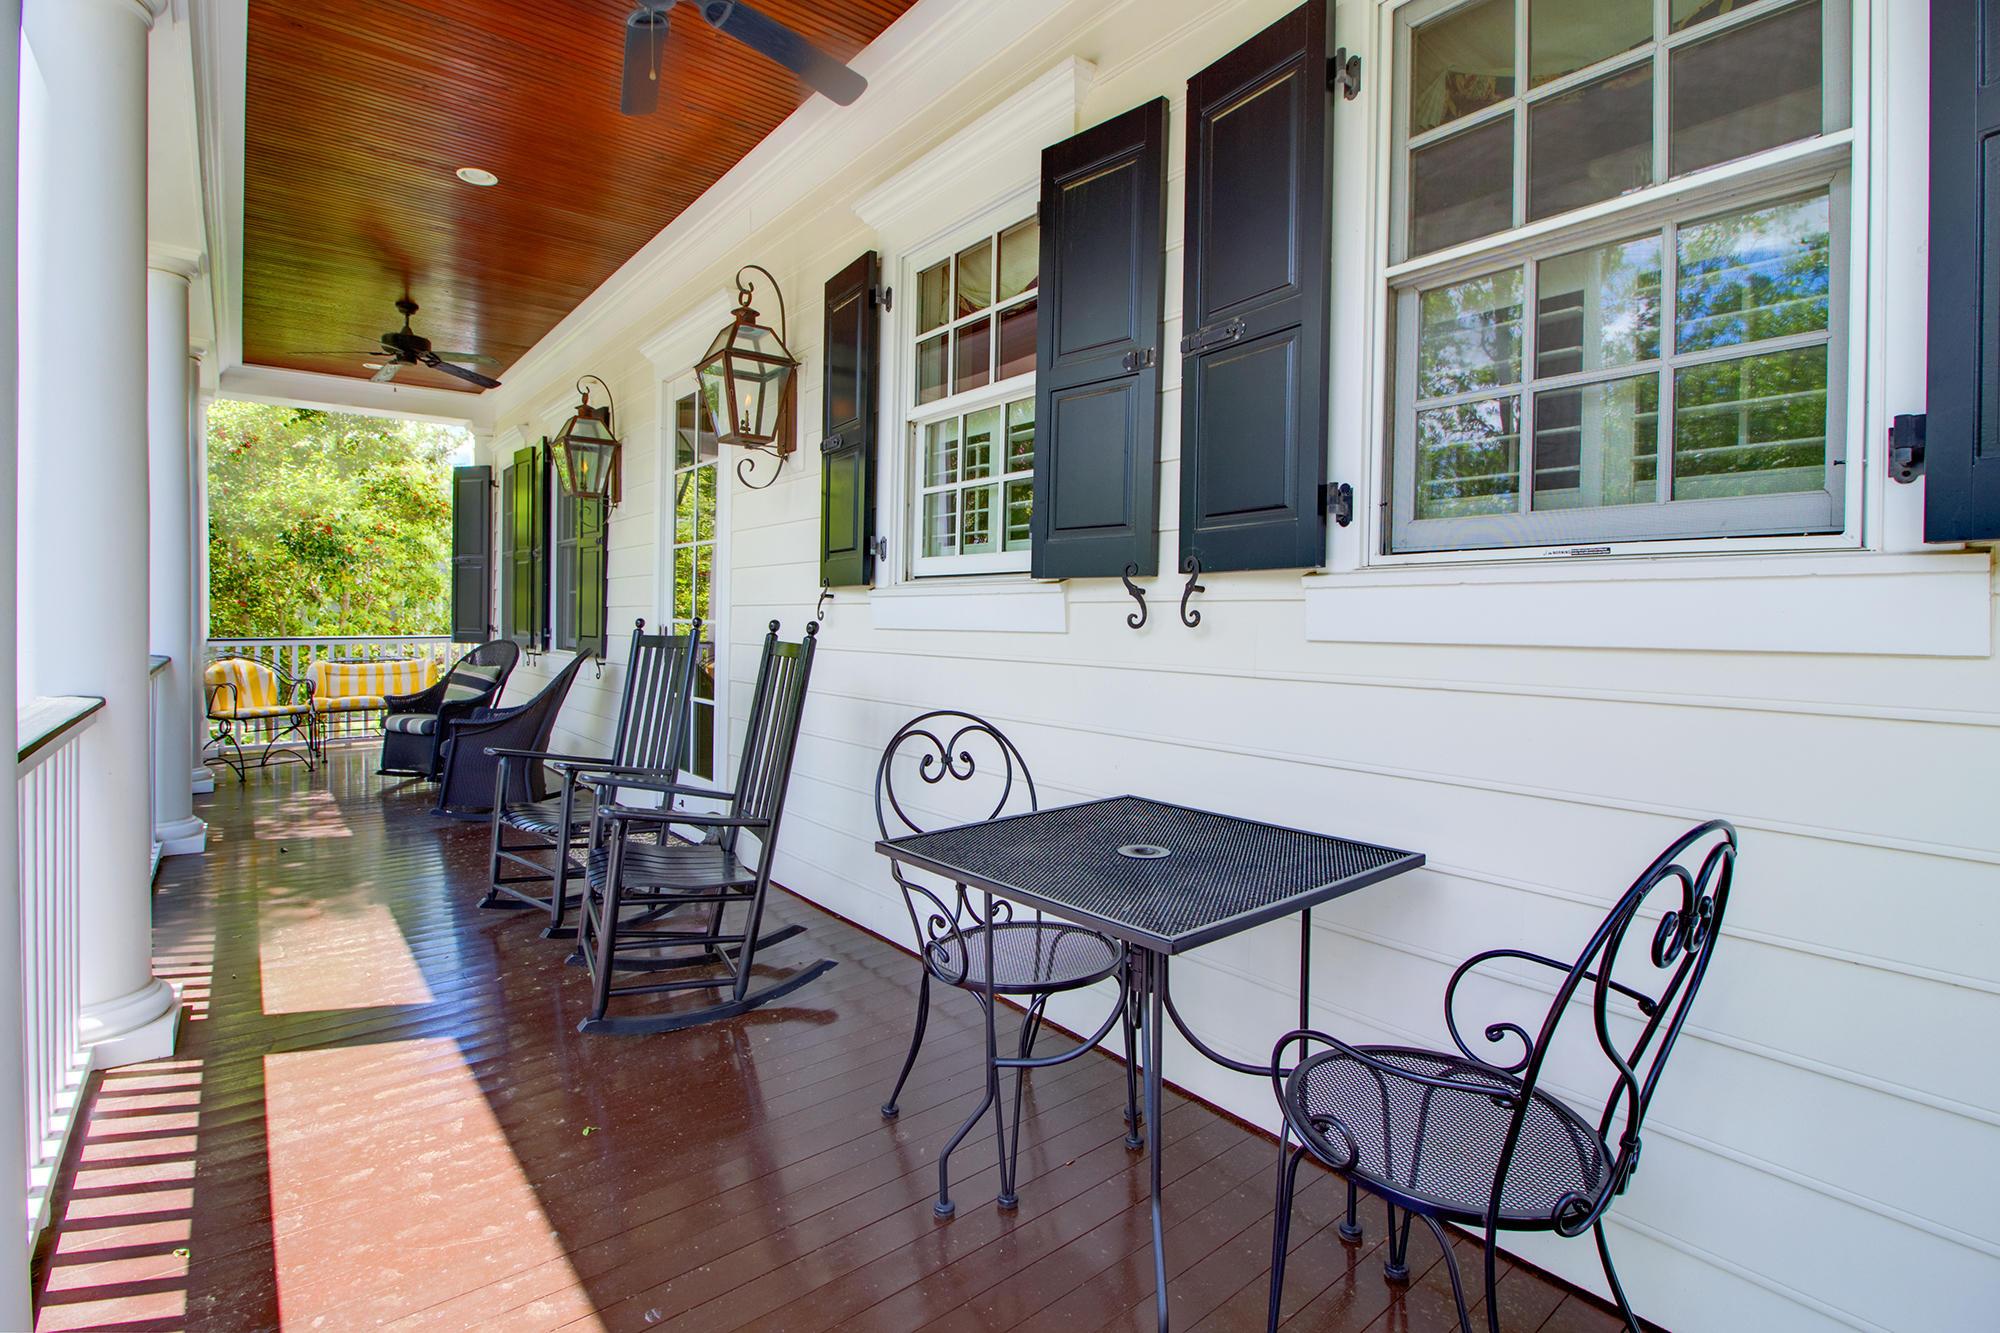 Daniel Island Park Homes For Sale - 1 Lafar, Daniel Island, SC - 66